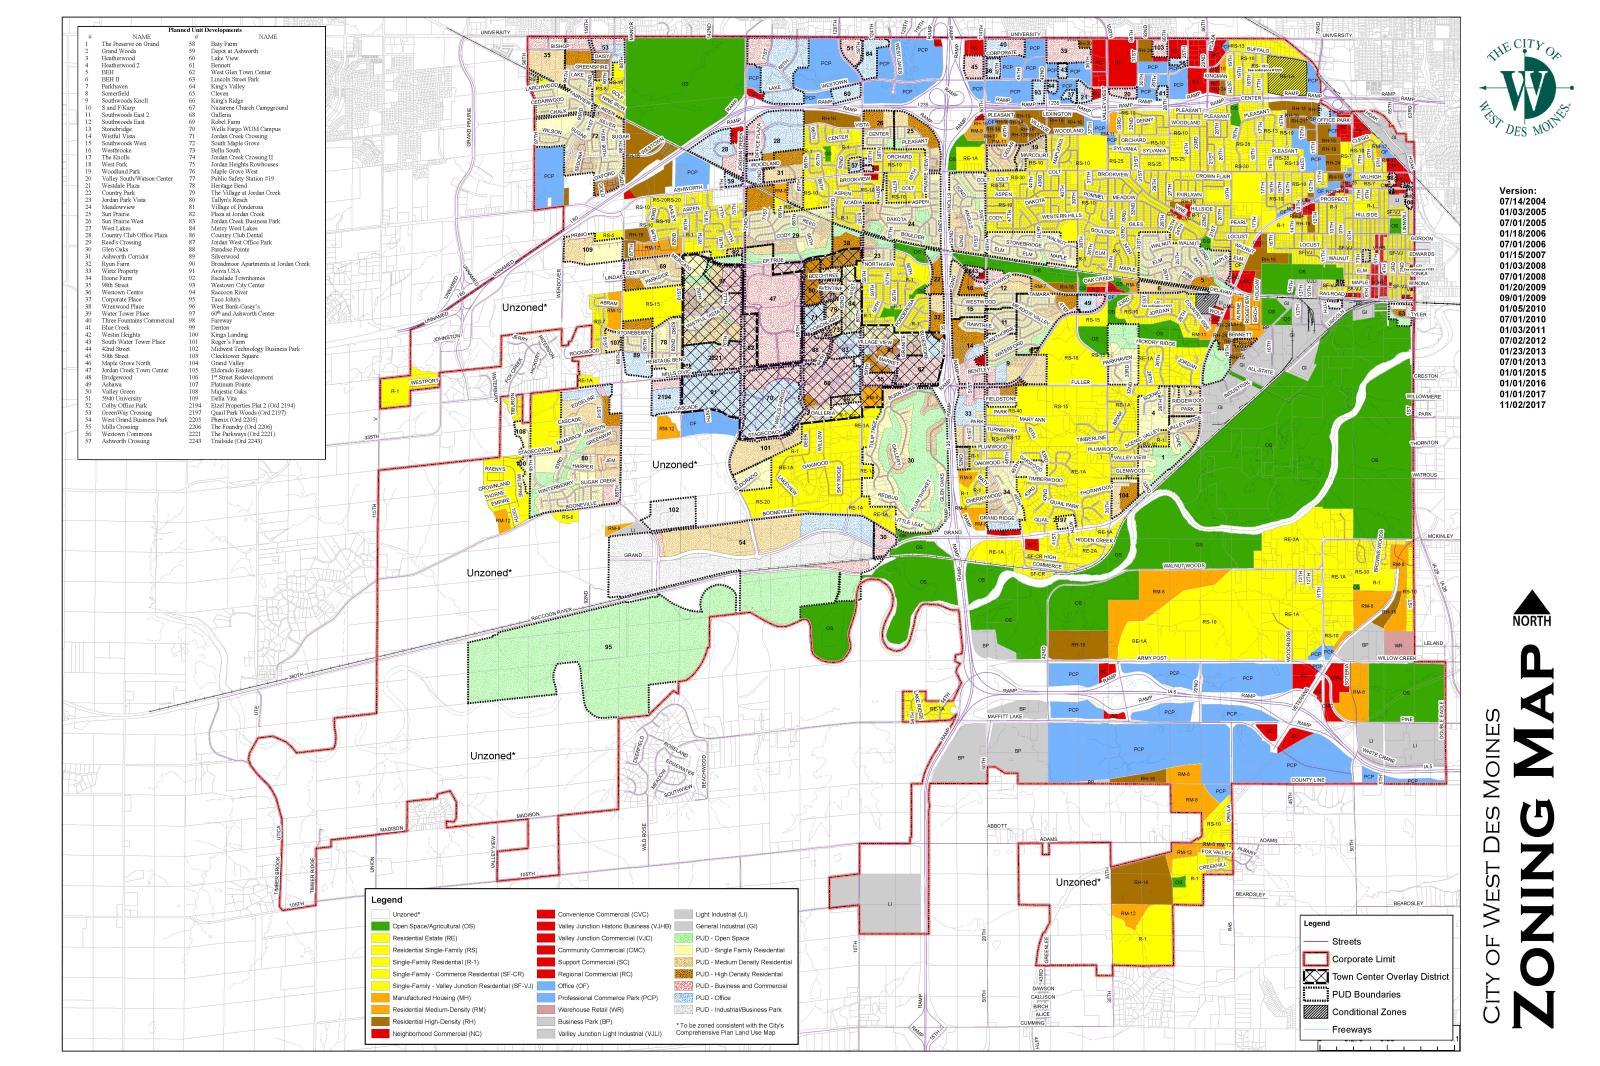 Choosing a Location | West Des Moines, IA on rock valley map, tribune map, iowa map, plattsmouth map, renton map, carroll map, audubon county map, winterset map, thurmont map, south bellevue map, omaha map, simsbury map, felida map, aurelia map, mirrormont map, wilmington international airport map, spokane falls map, northeast tacoma map, adair map, united states map,